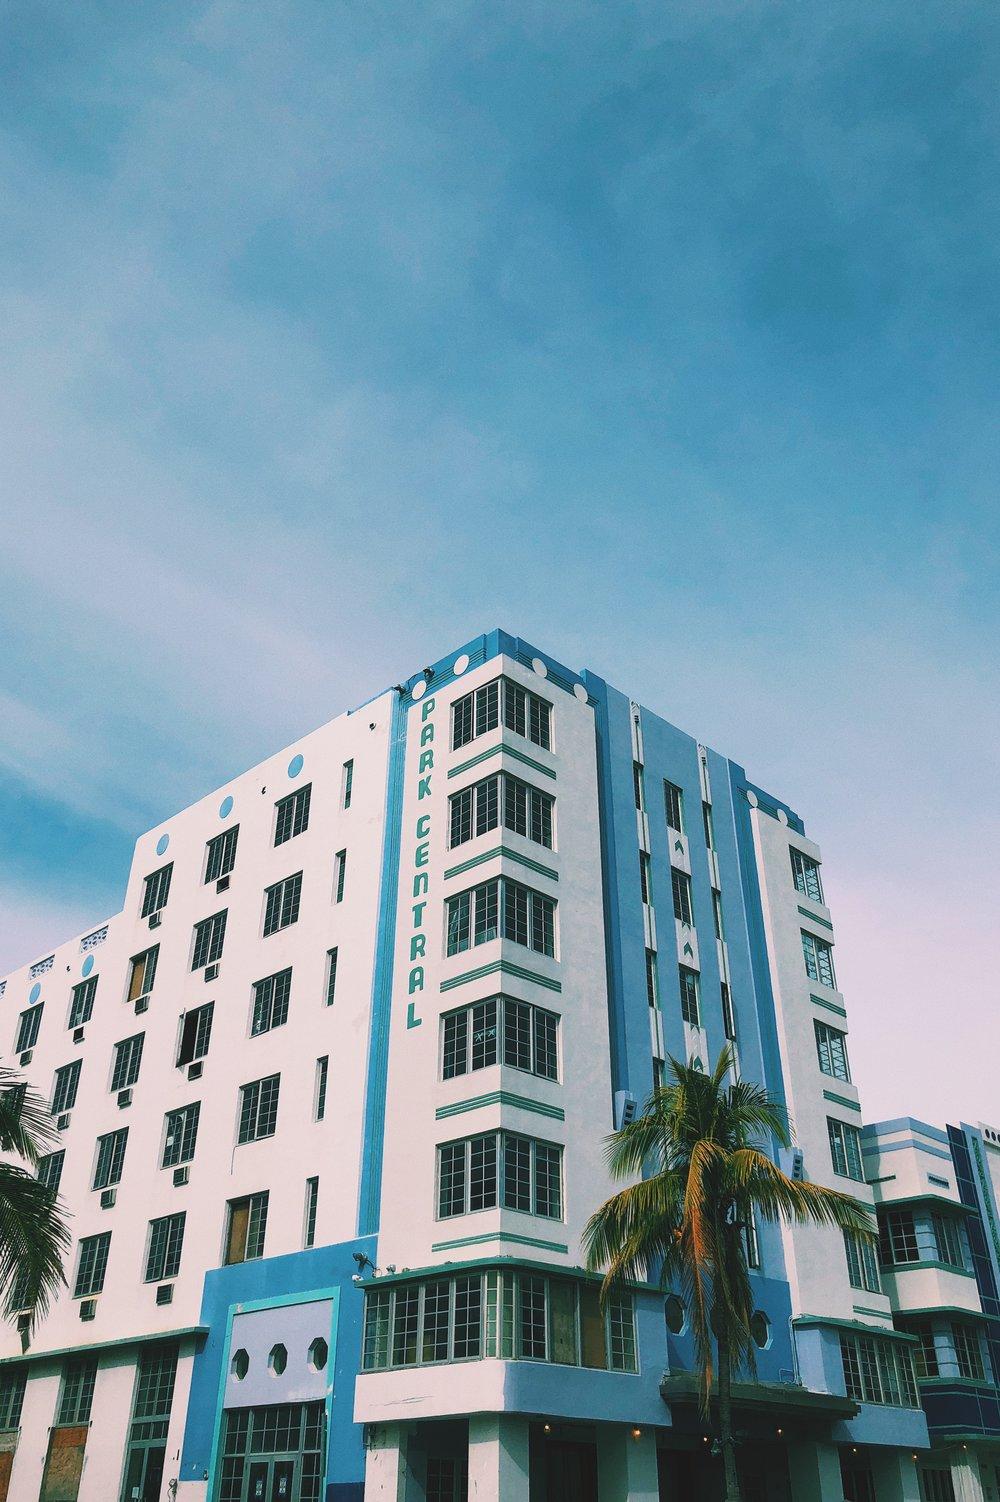 Miami - Building photography